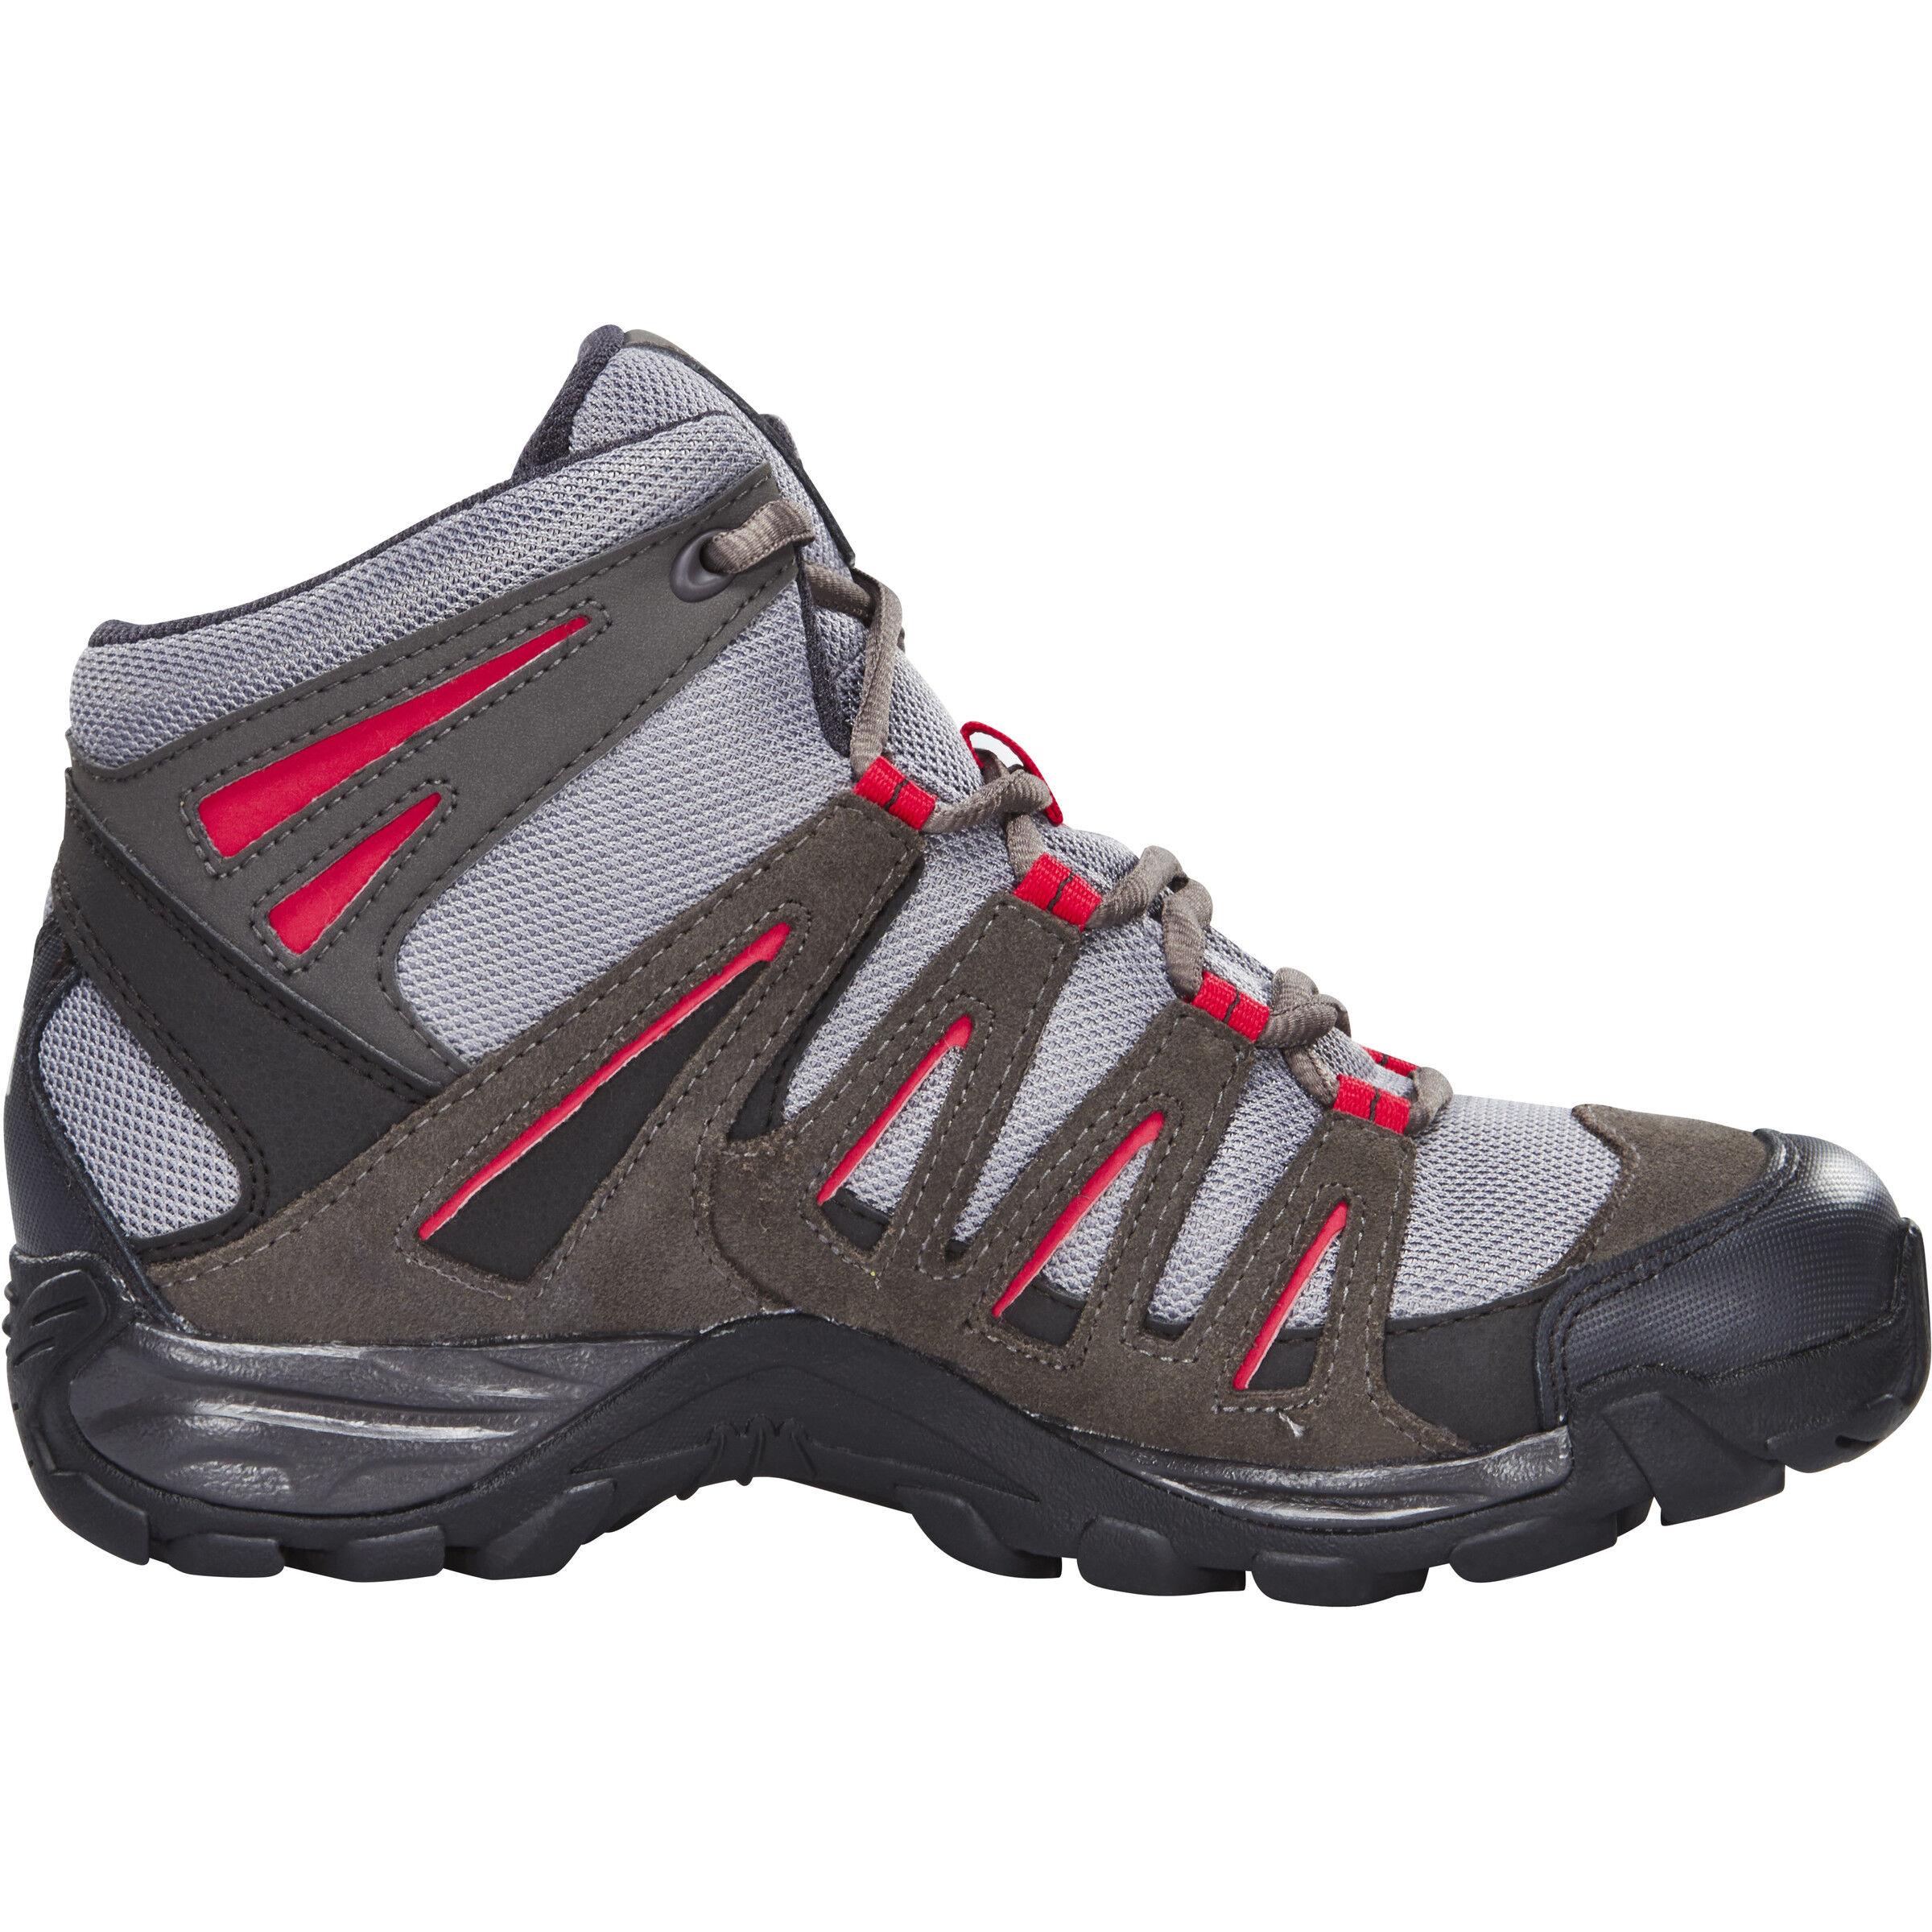 Salomon Ridgeback Mid GTX Shoes Damen detroitautobahnlotus